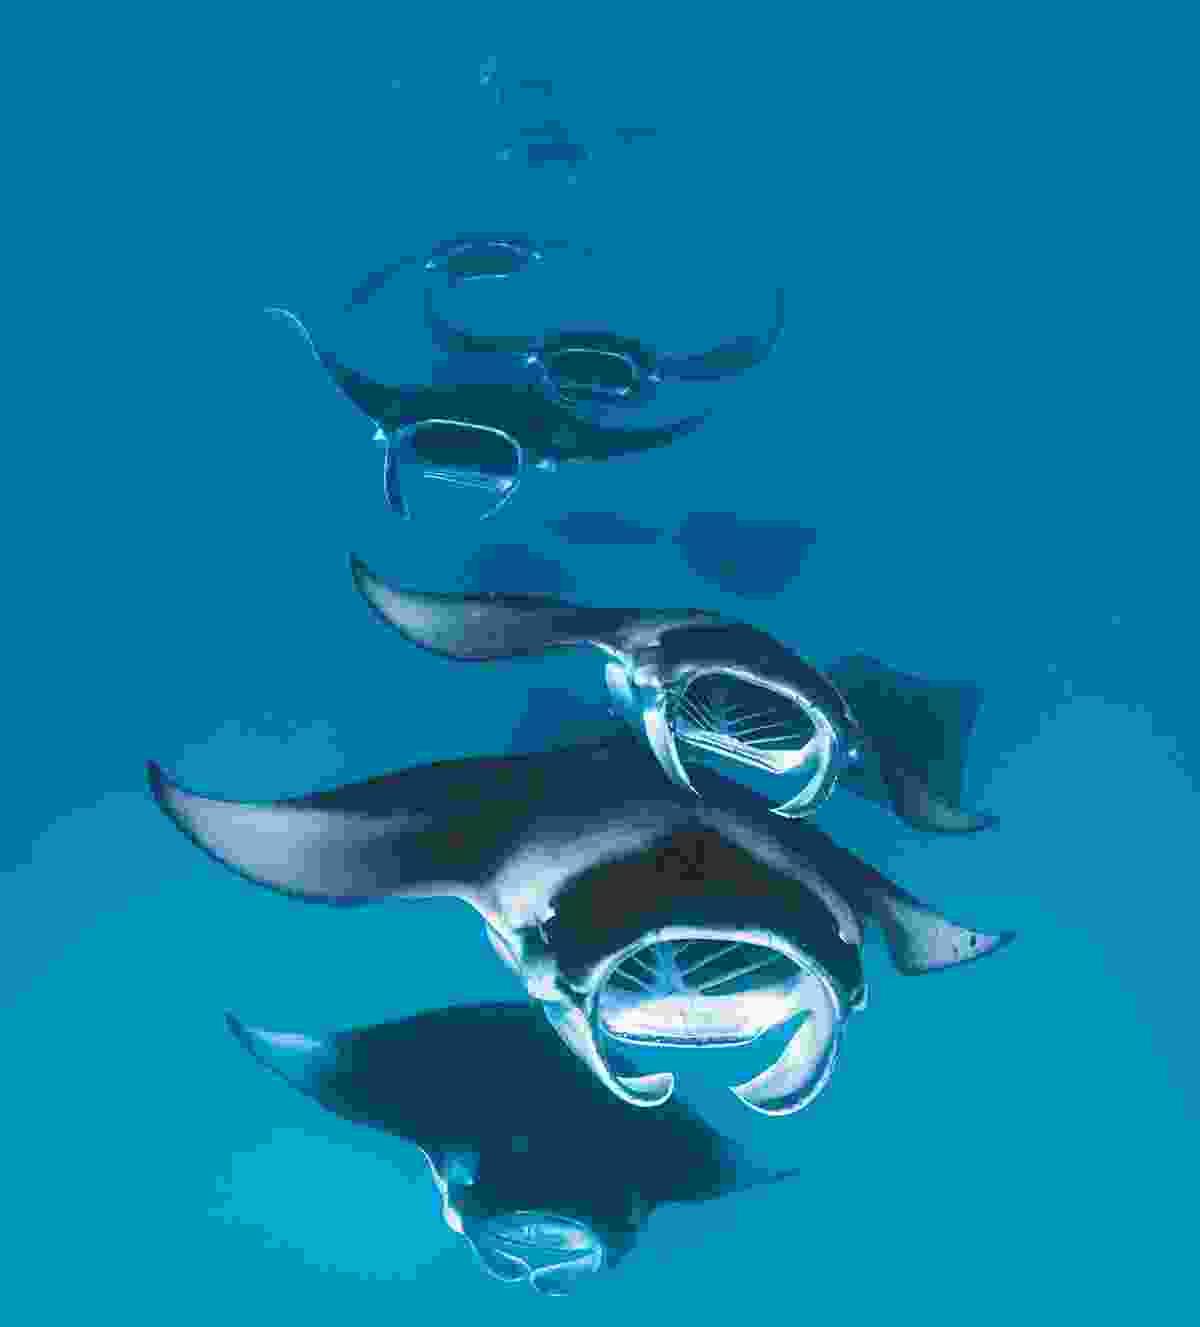 Manta rays in formation (Doug Perrine/naturepl.com)